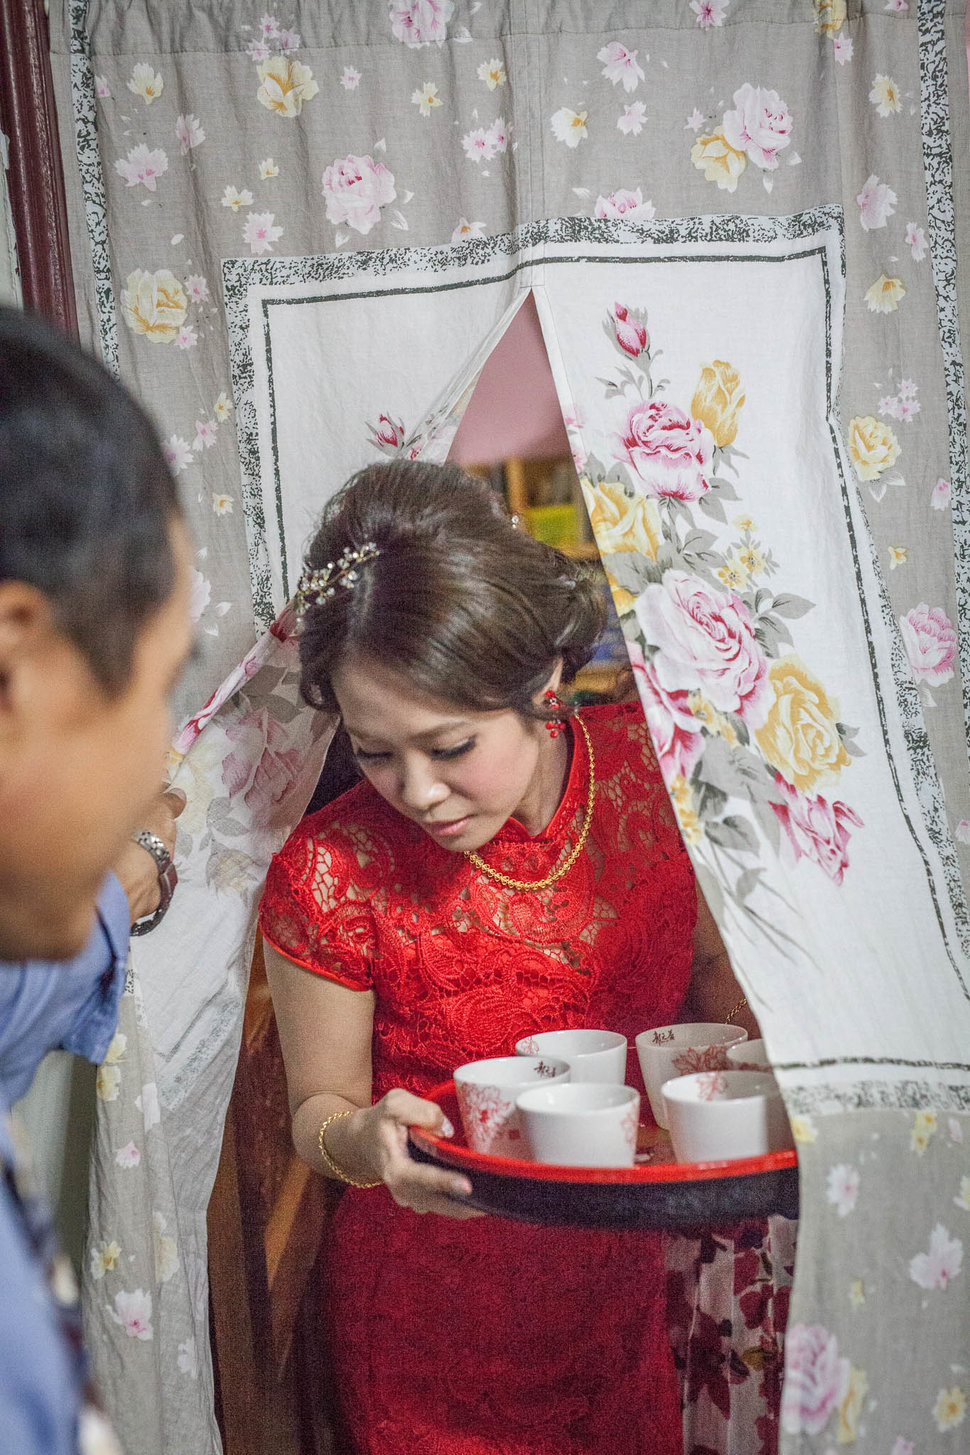 18PHOTO-TIM❤️ ROSA(編號:220636) - 18PHOTO 婚紗影像攝影工作室 - 結婚吧一站式婚禮服務平台